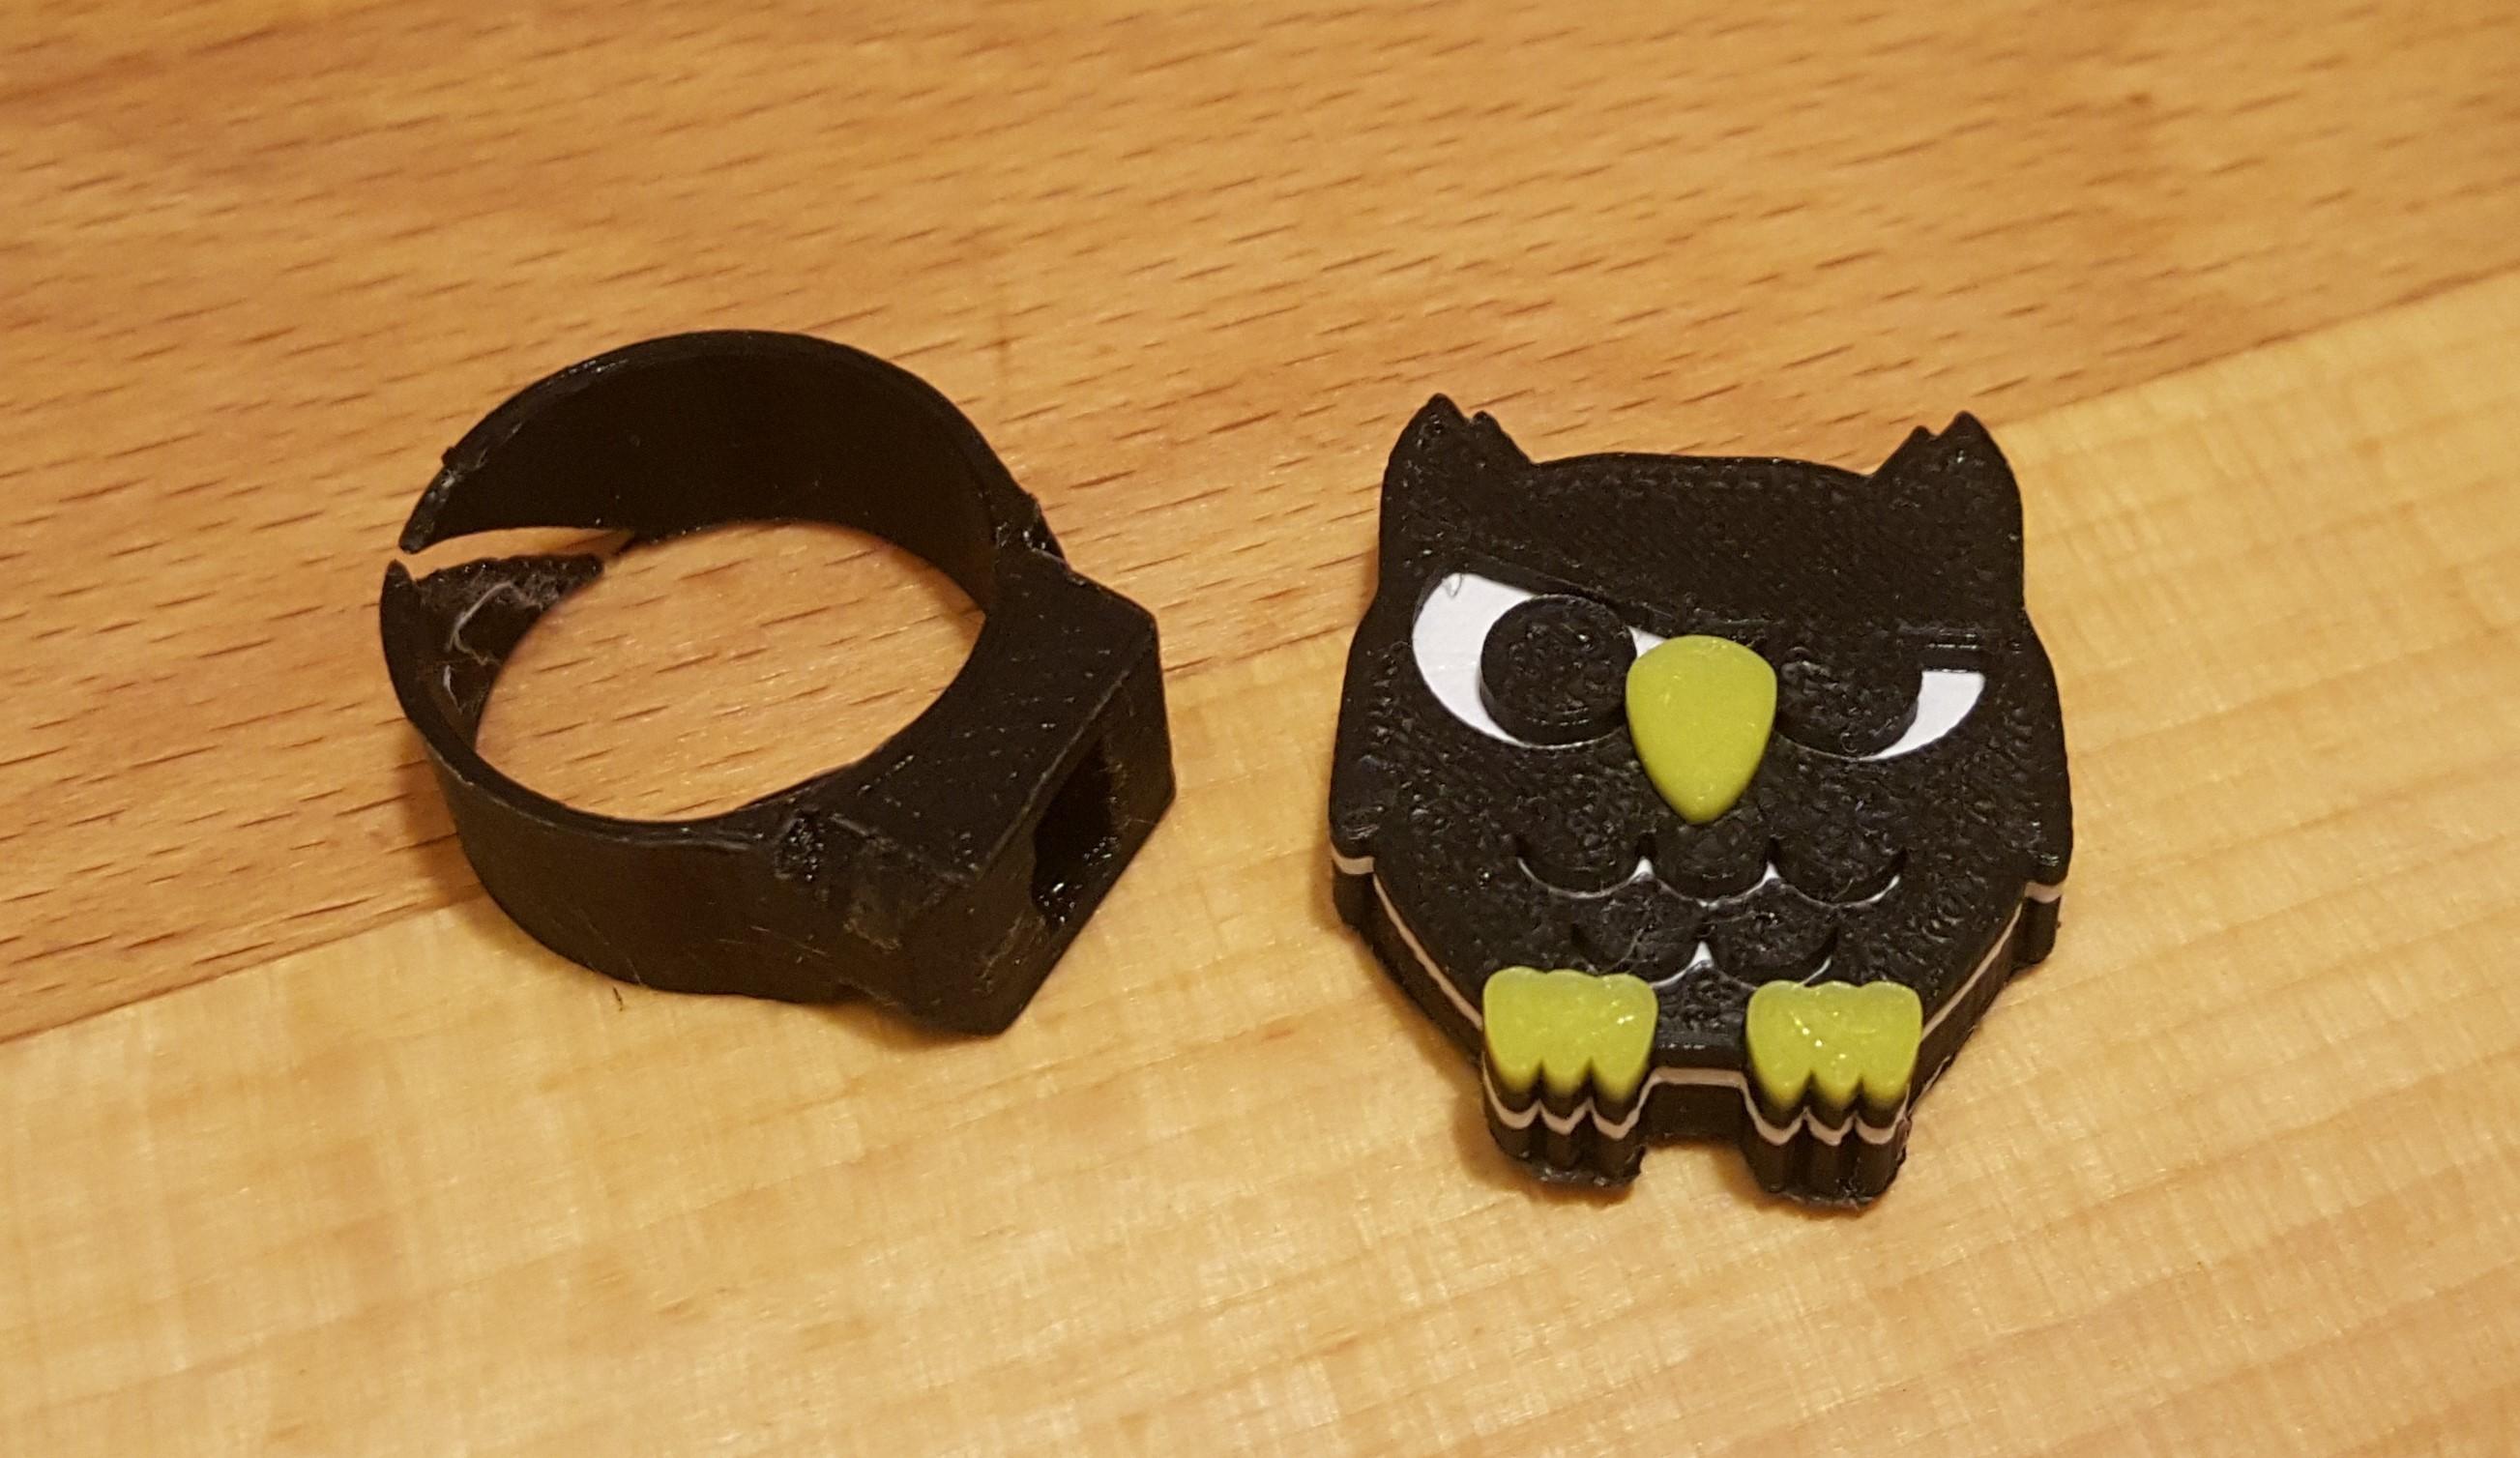 20181014_193348.jpg Download free STL file Owl support for modular ring • 3D printer design, H33ro